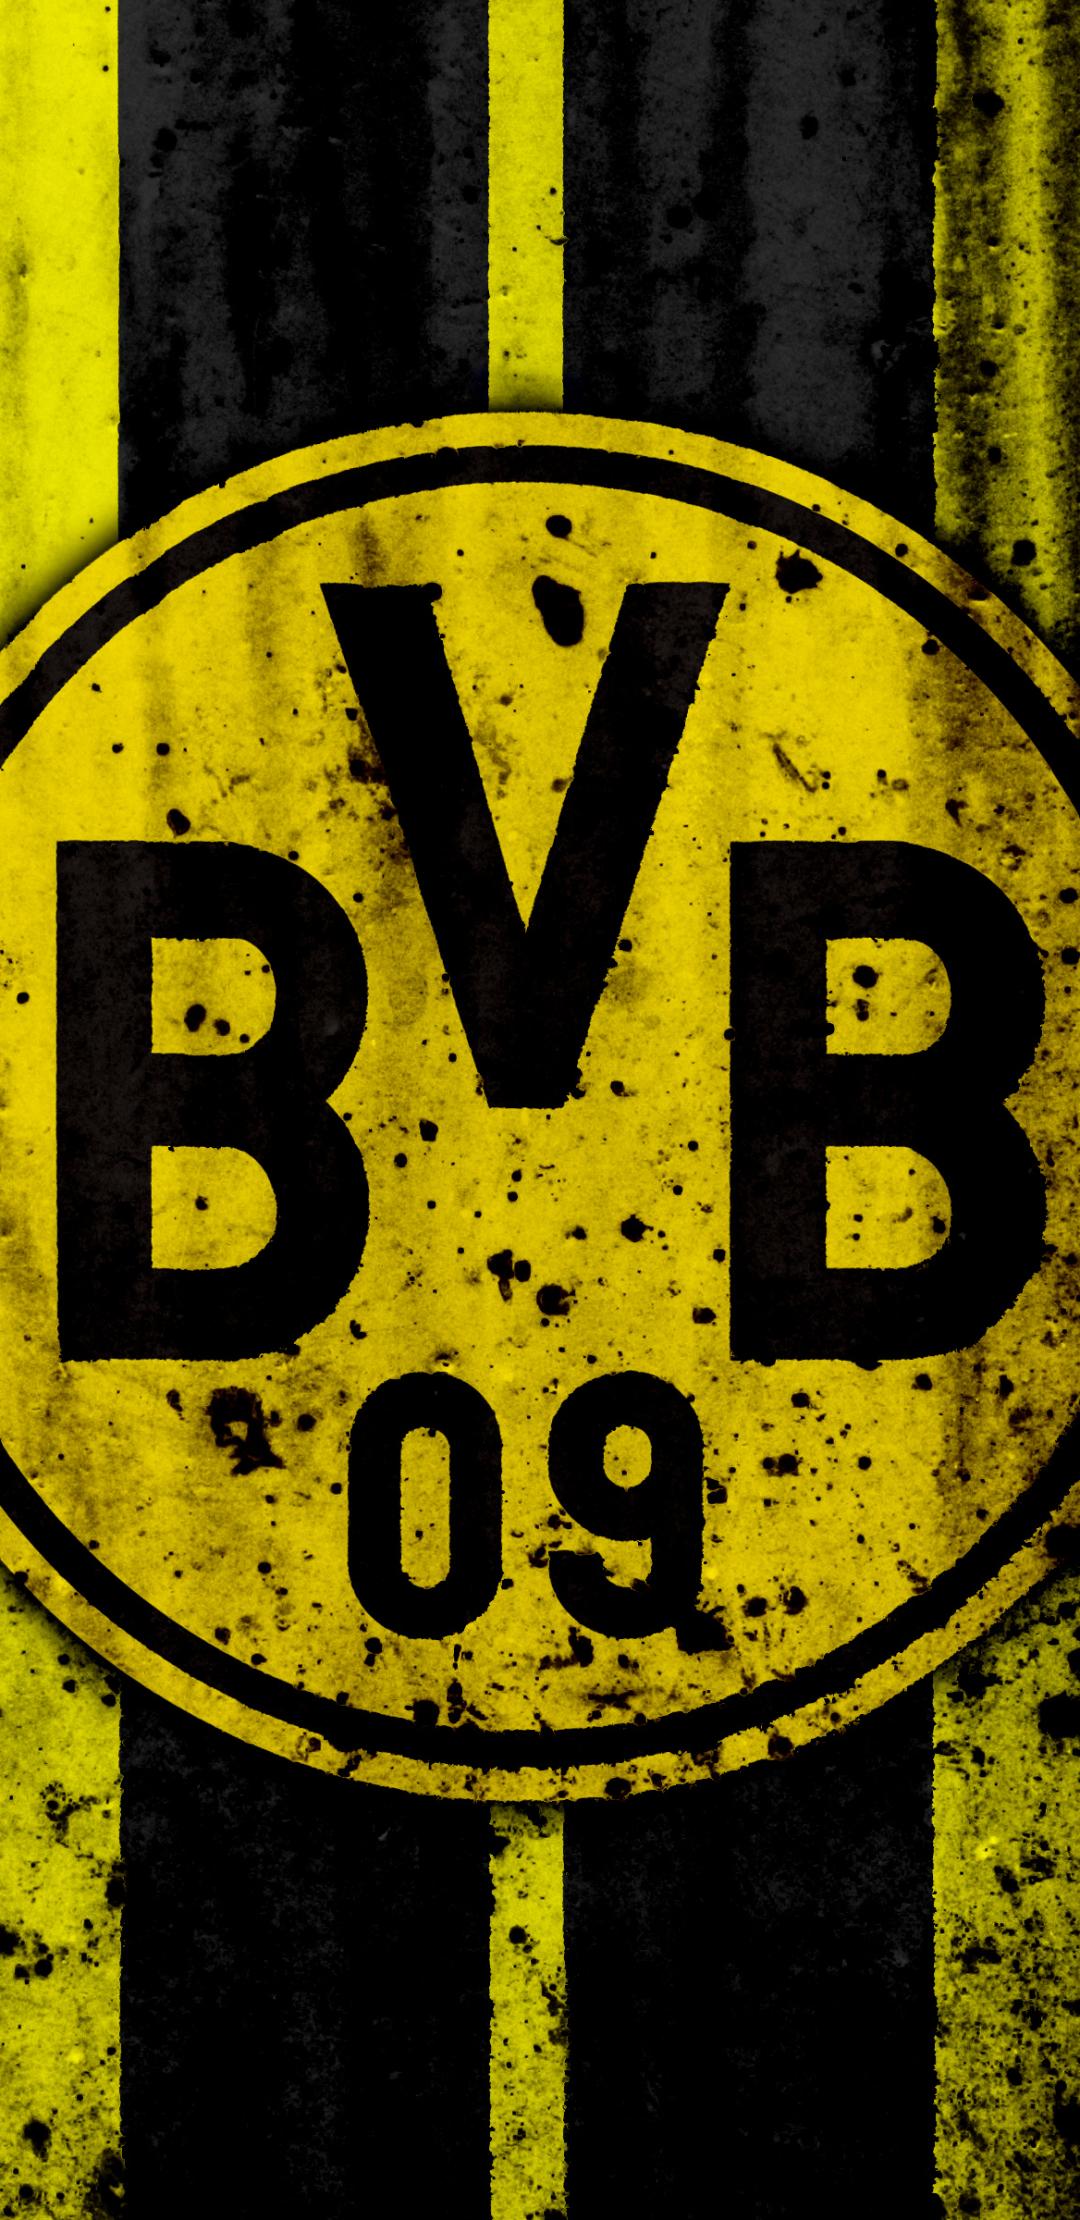 Borussia Dortmund Logo 2369658 Hd Wallpaper Backgrounds Download